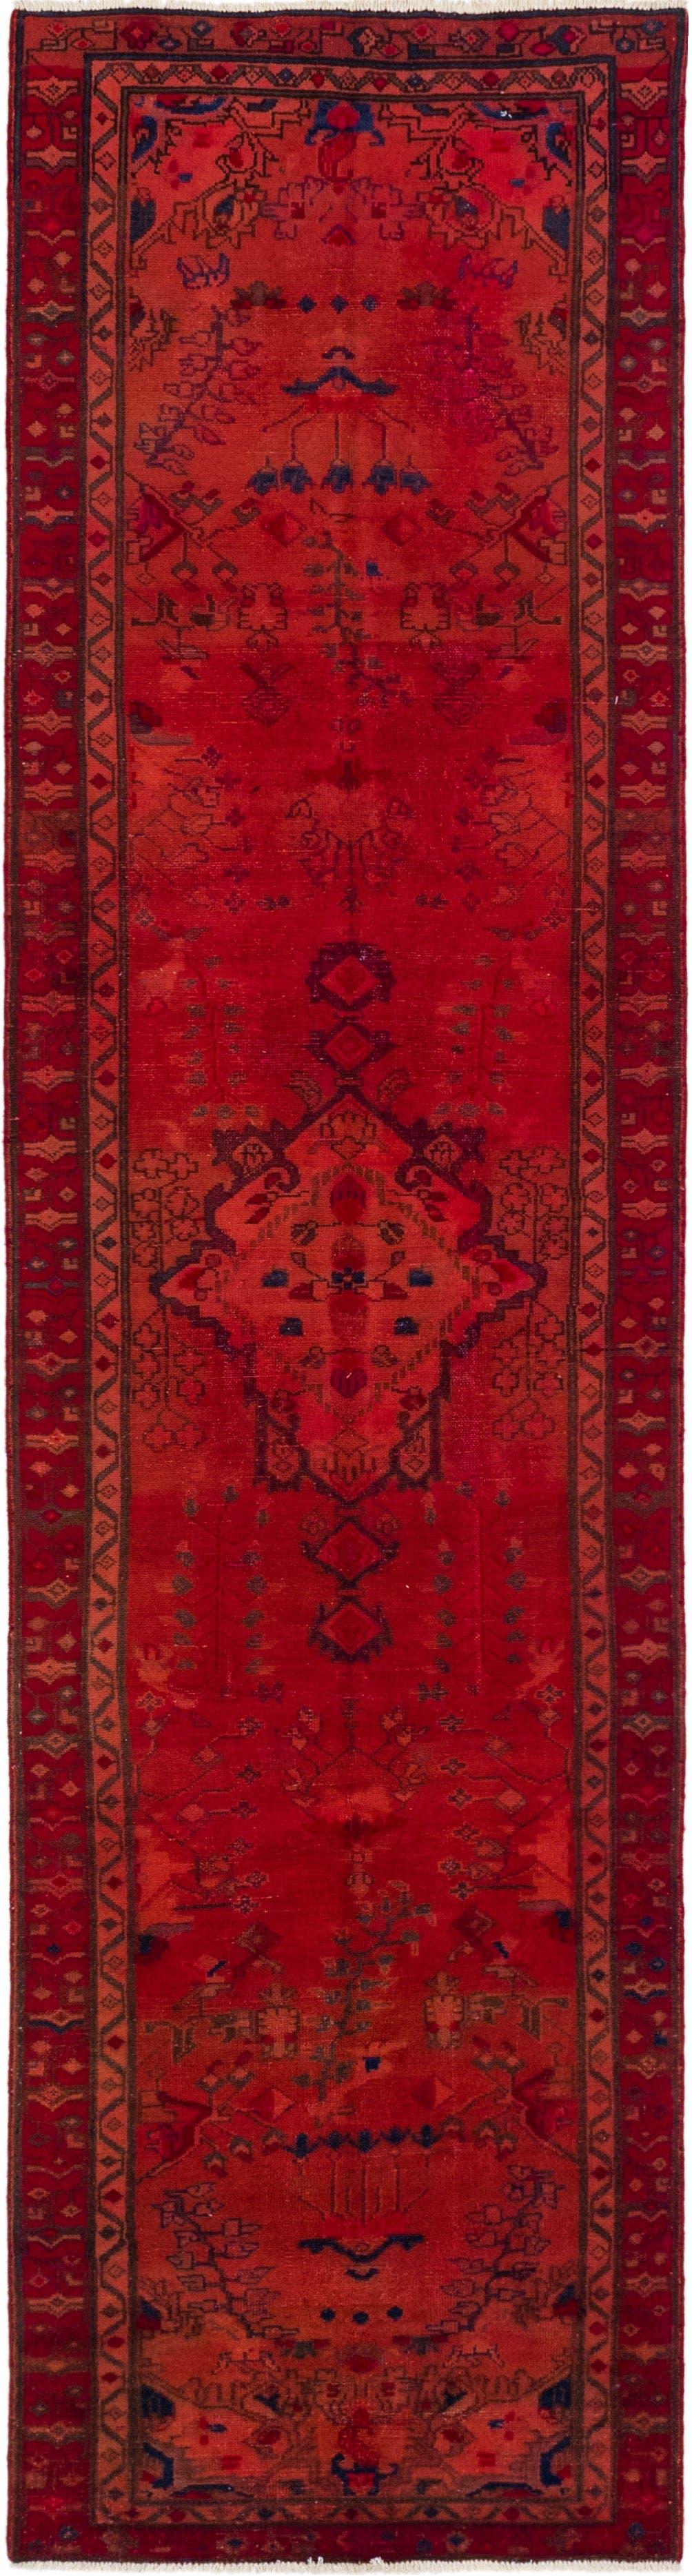 3' 1 x 11' 10 Ultra Vintage Persian Runner Rug main image